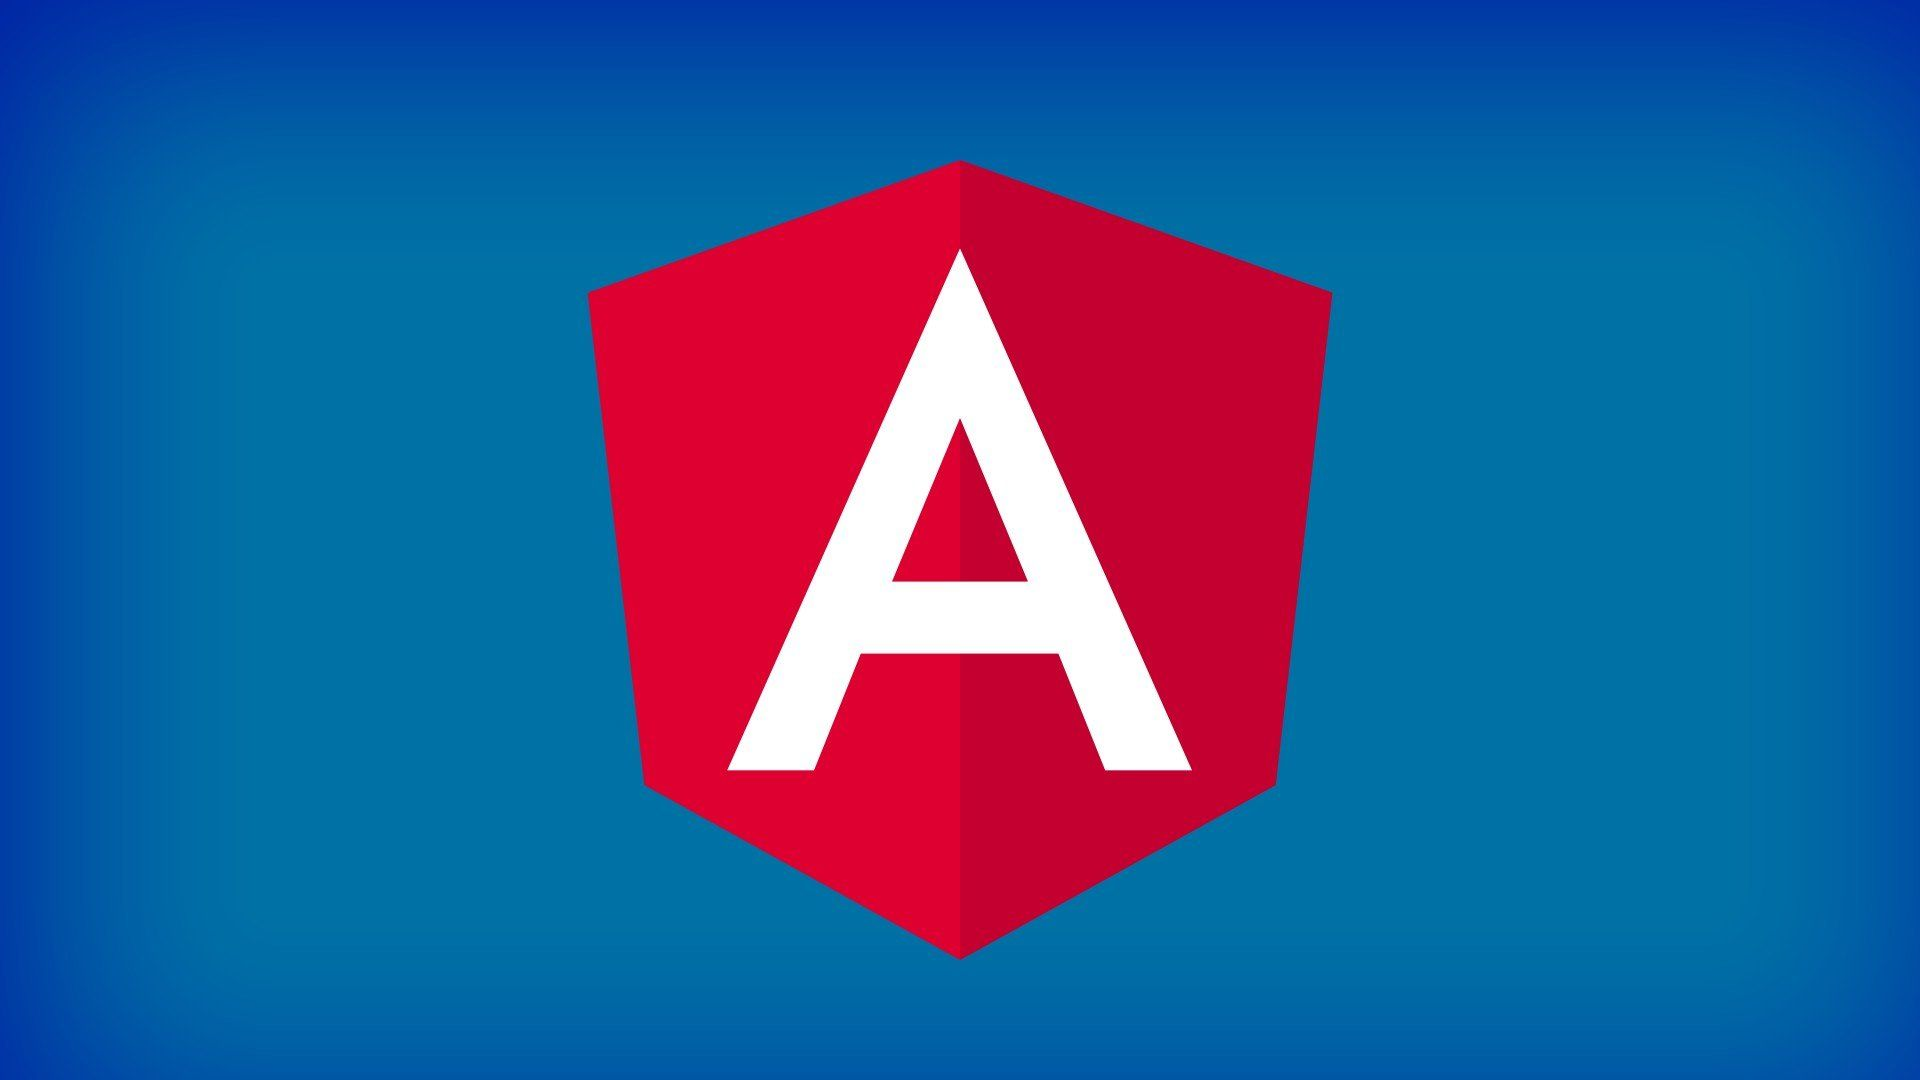 Benefits of Using Angular for Web Development 2021